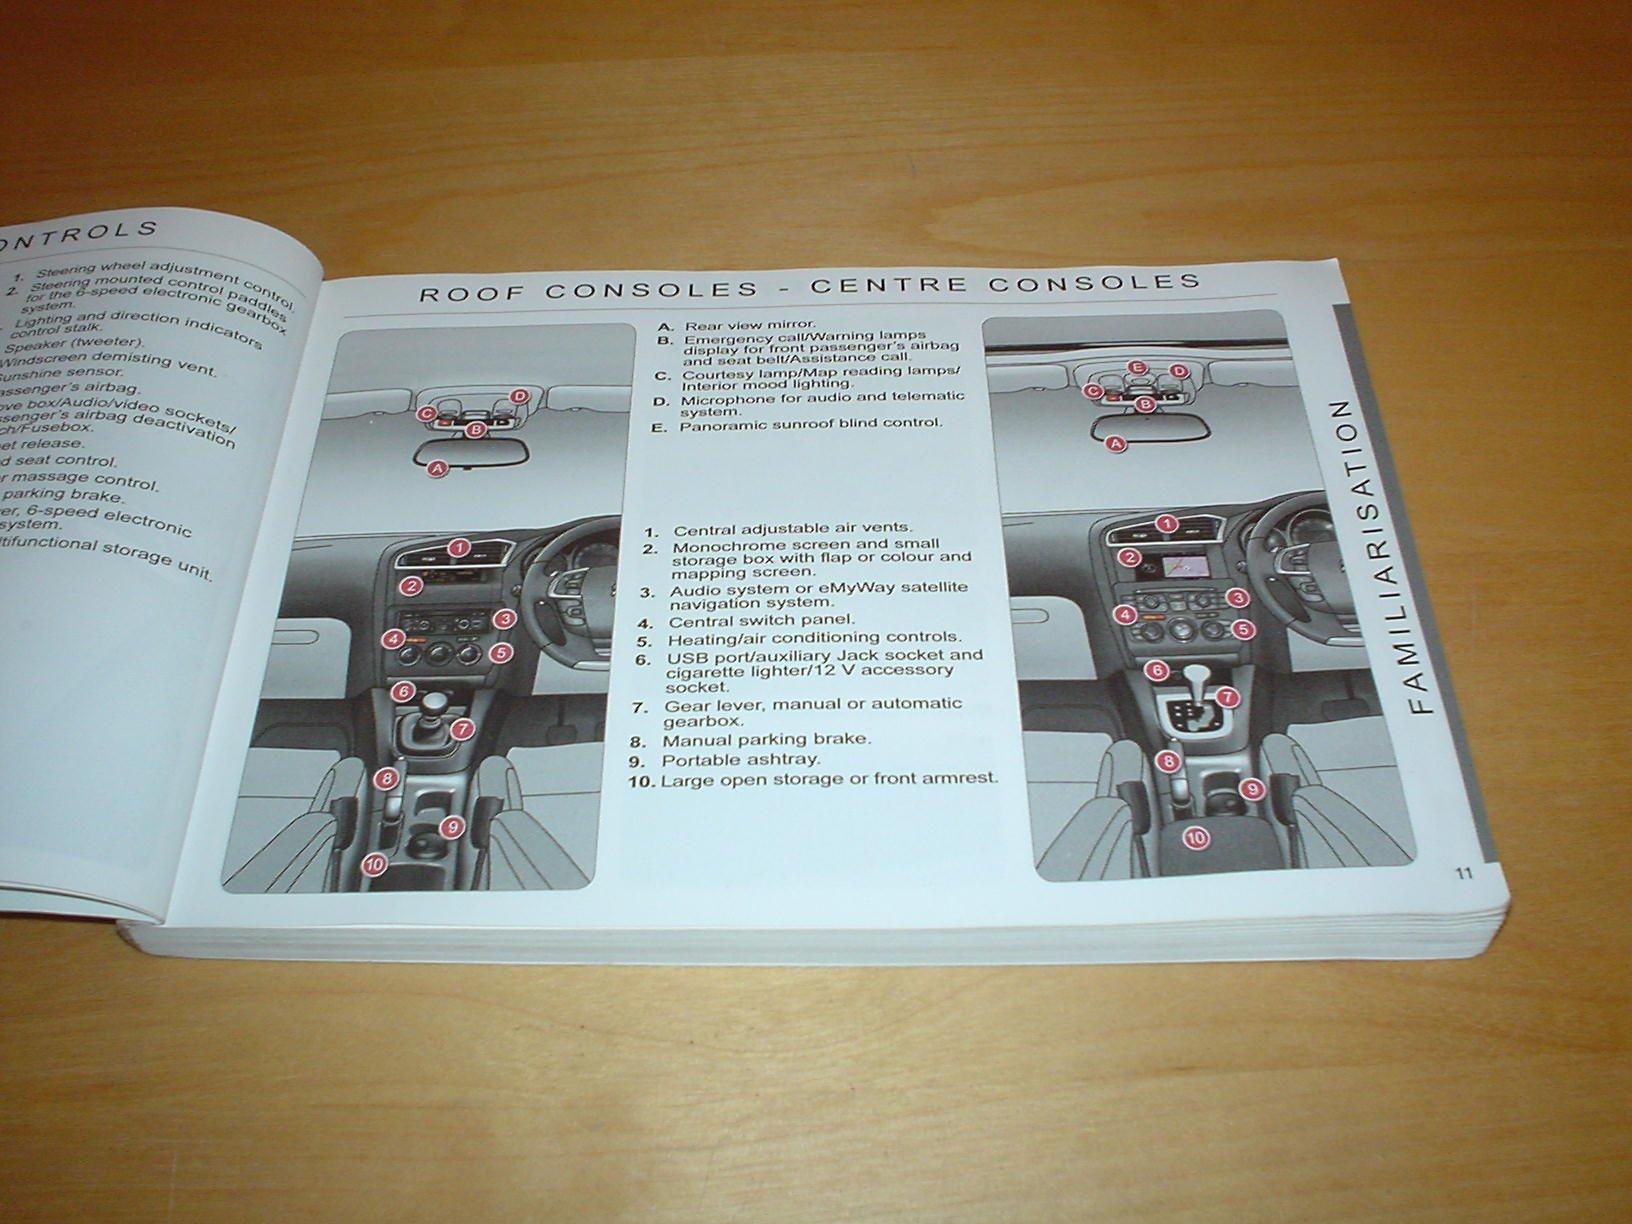 Citroen C4 Owners Handbook C W Wallet 2010 2014 14 16 Litre Cigarette Lighter Fuse Vti Thp Petrol 20 Hdi 90 110 150 Diesel Engines Hand Book Manual